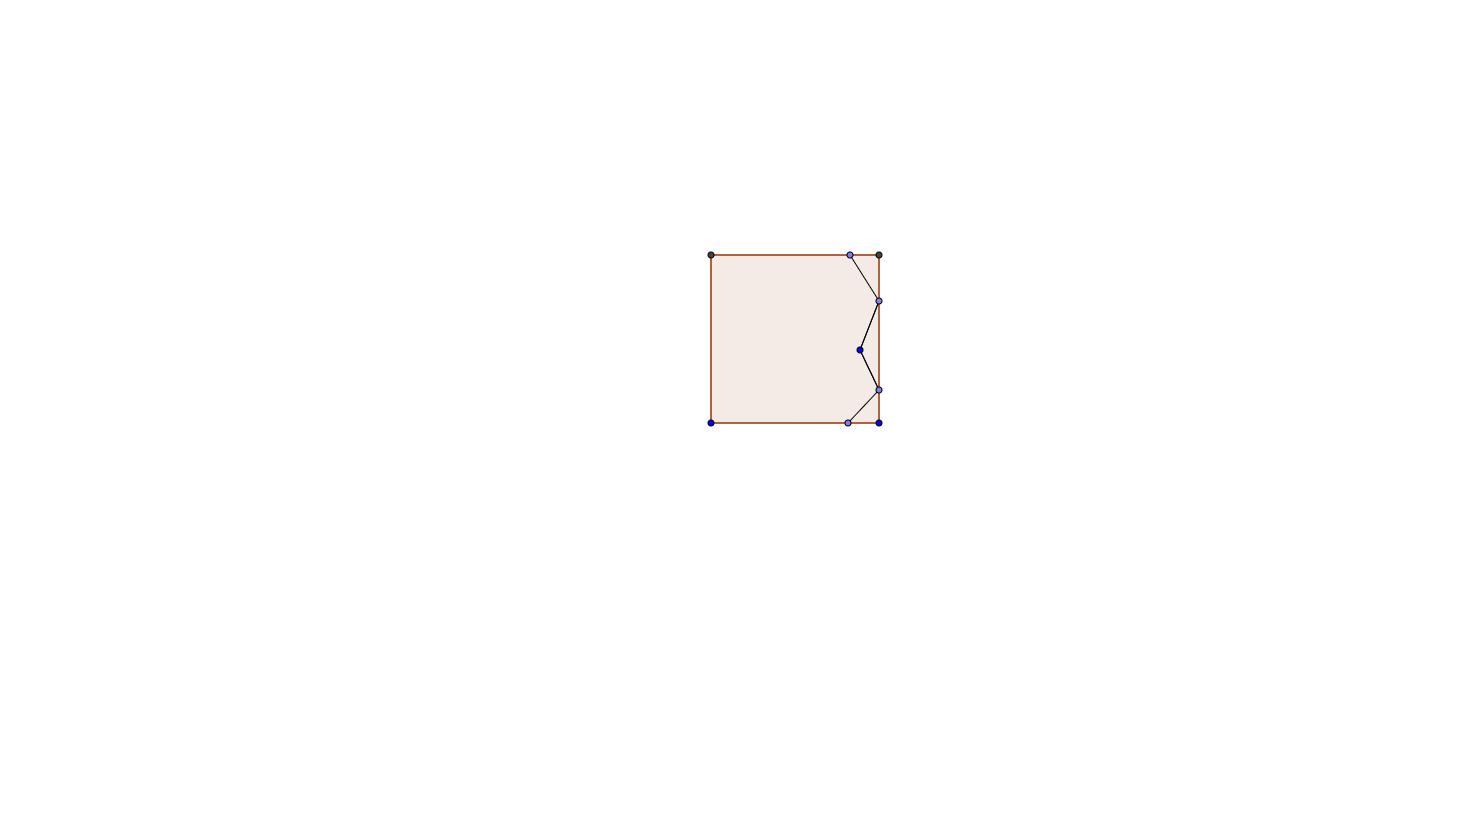 Tessellation Step 1: First side of tessellation